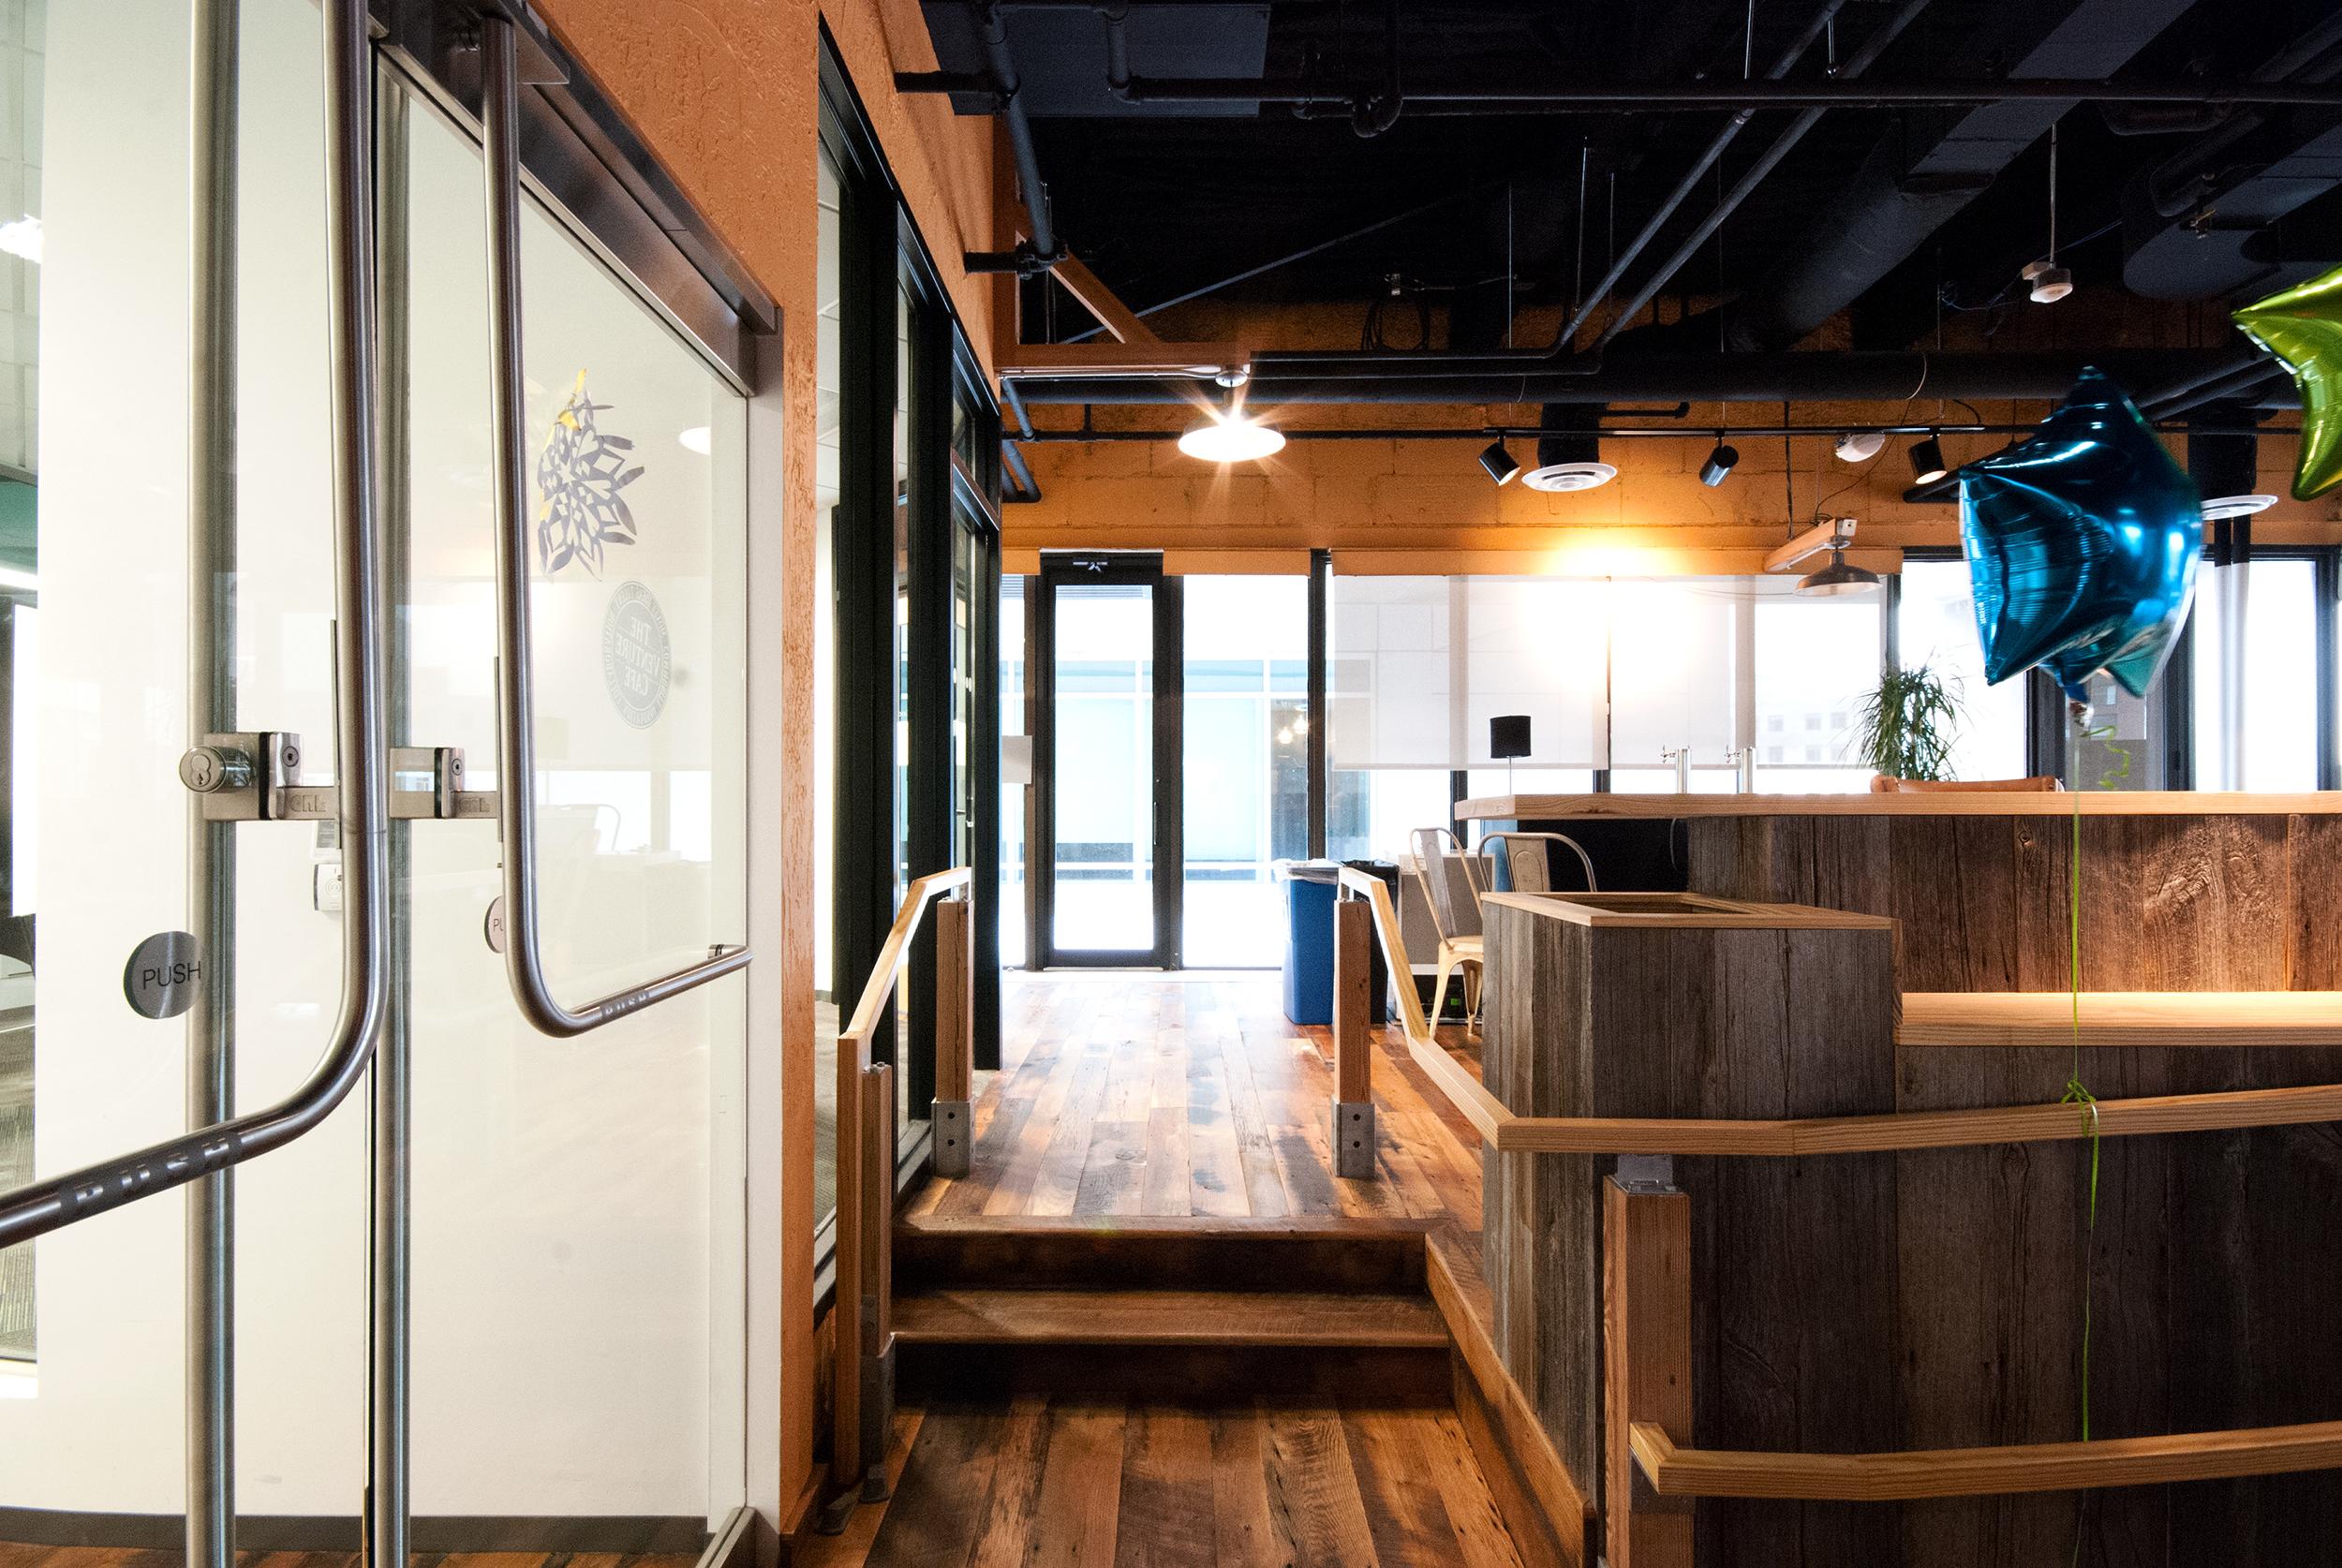 2013.12-17_CIC 5th Floor - 039.jpg